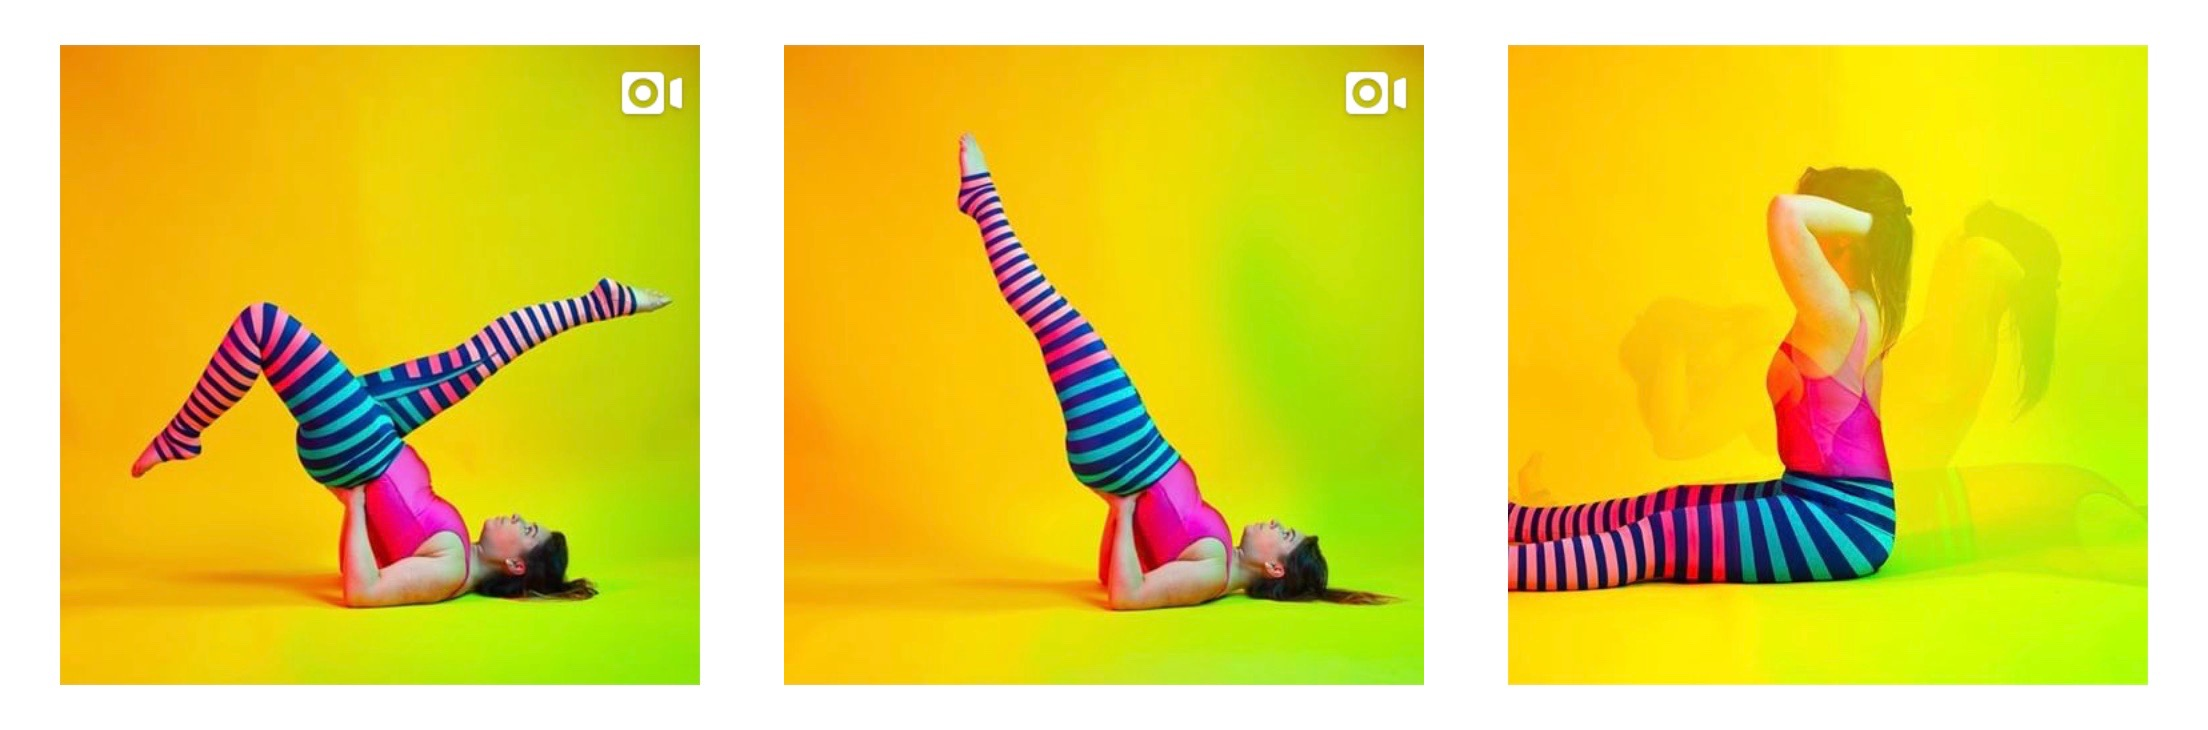 March-Matness-2019-Superstars-Swan-Dive-Pilates